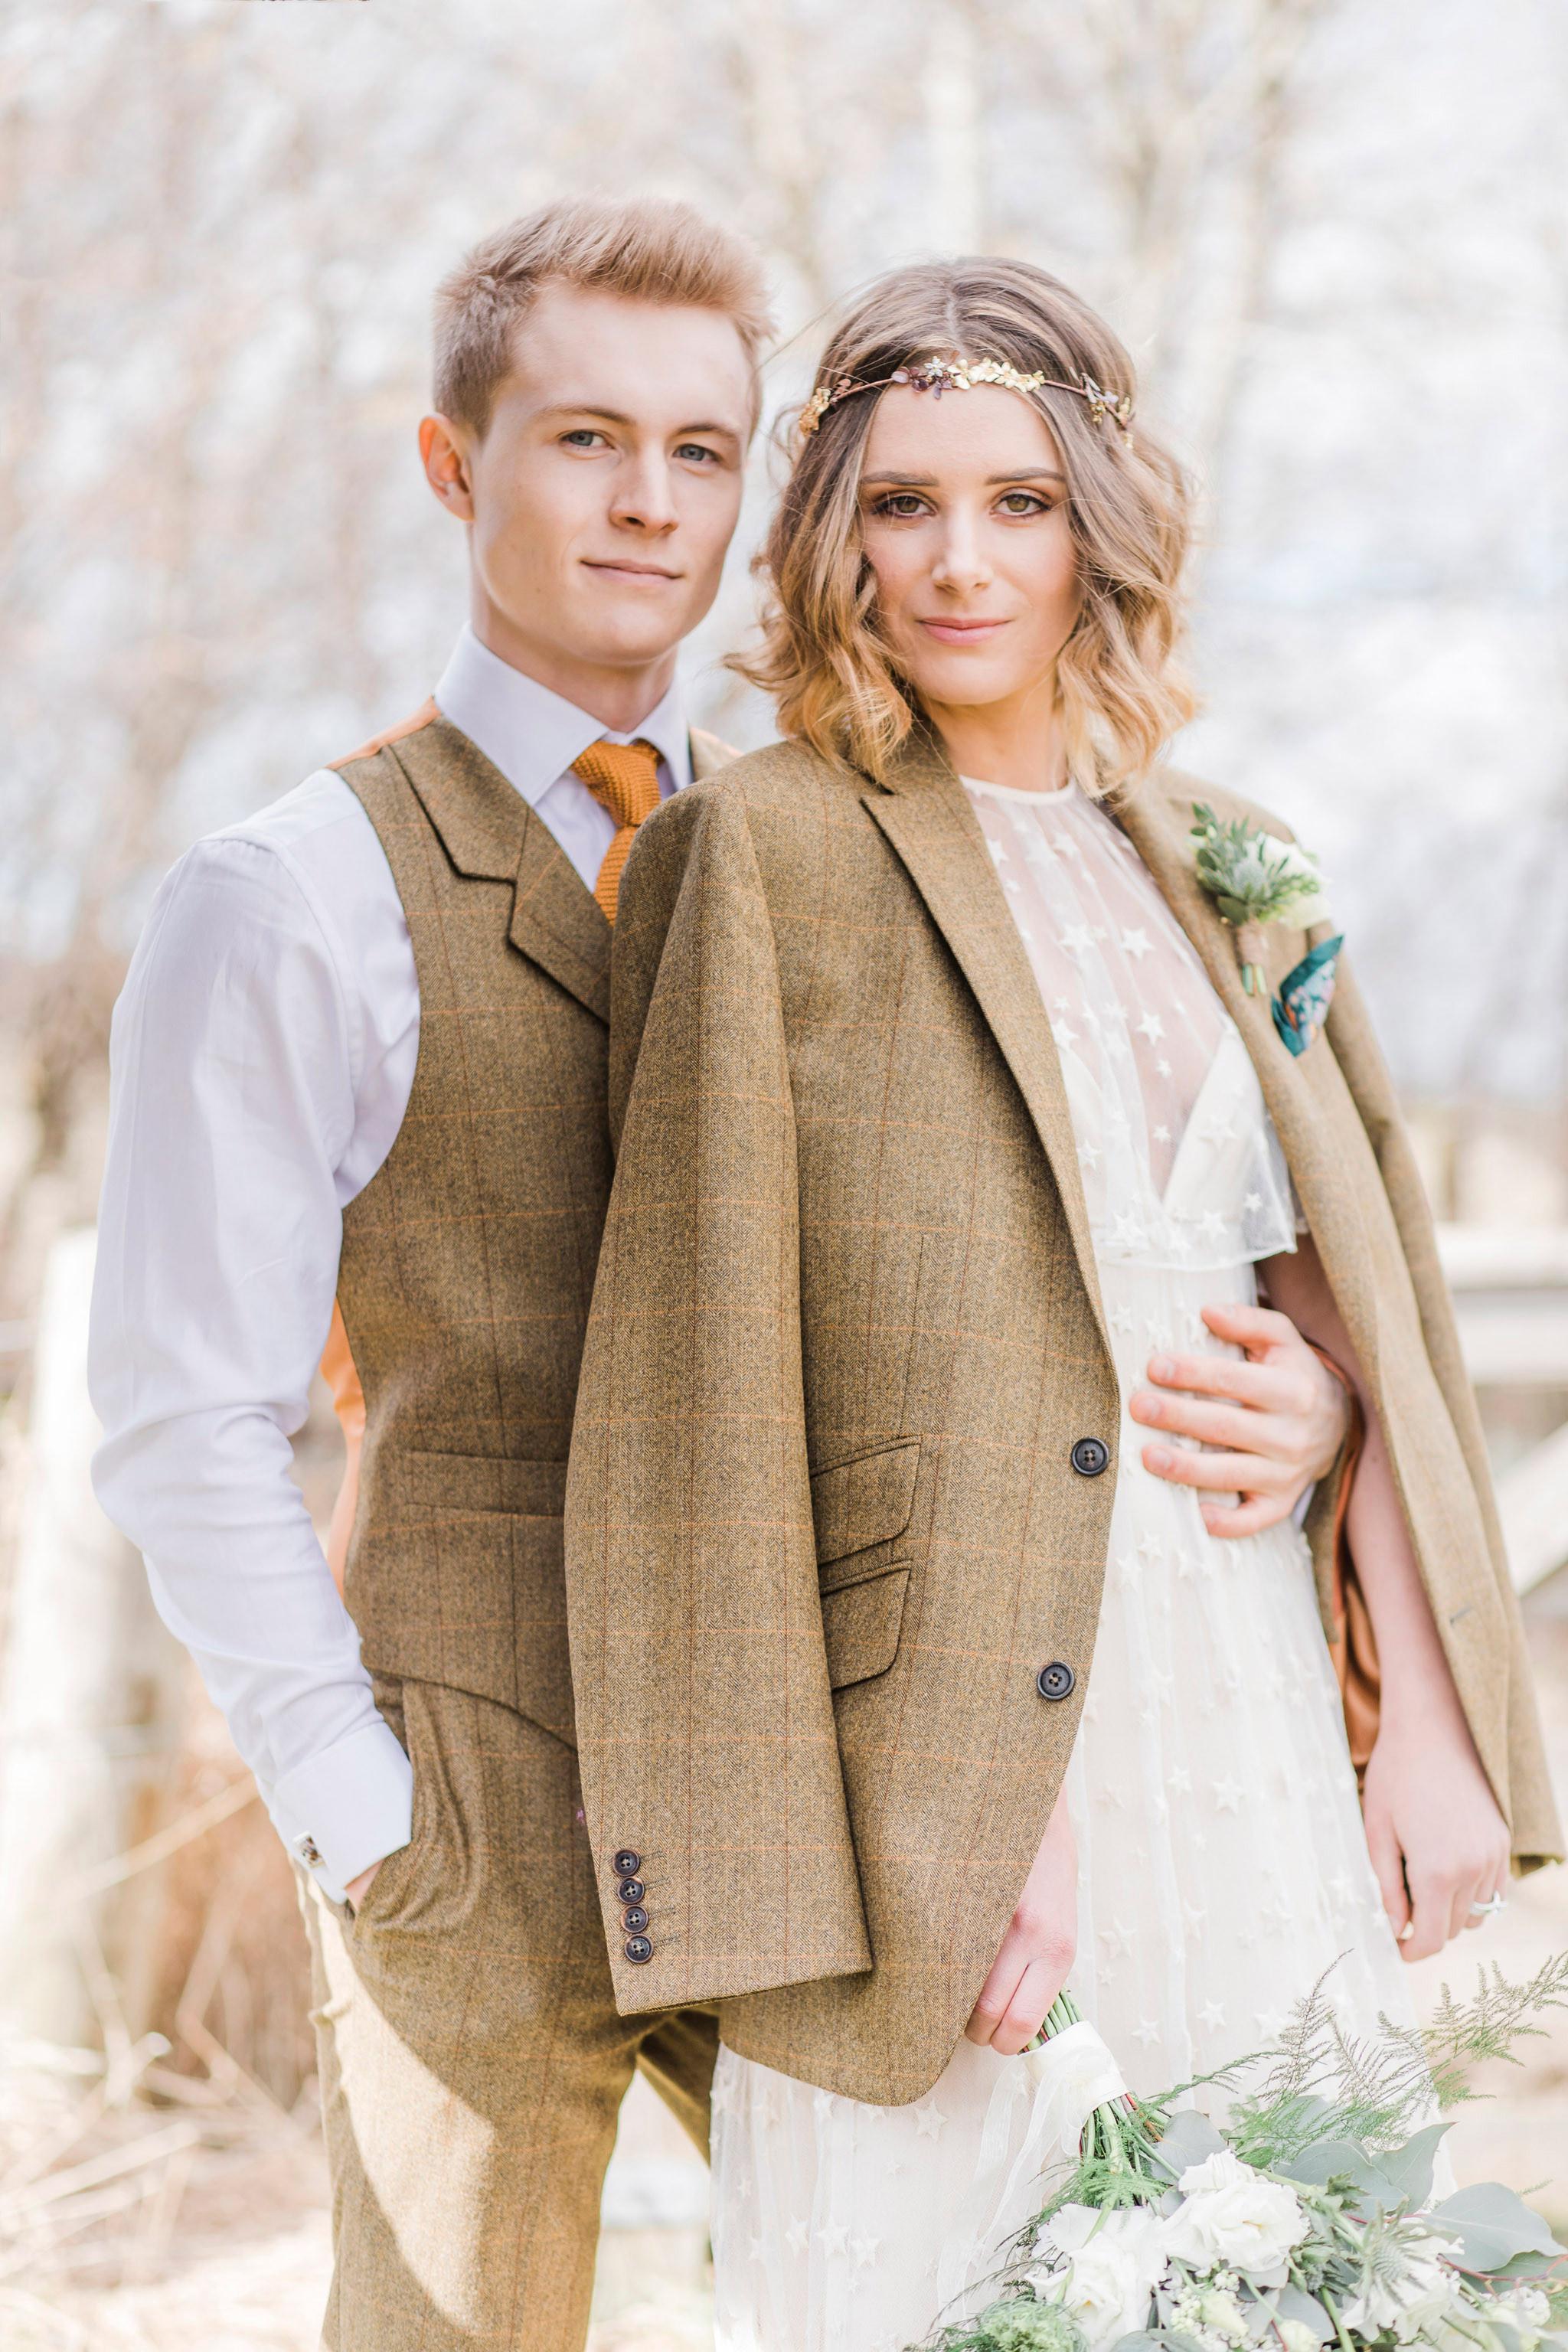 rustic-romantic-outdoor-wedding-photographer-edinburgh-09.jpg